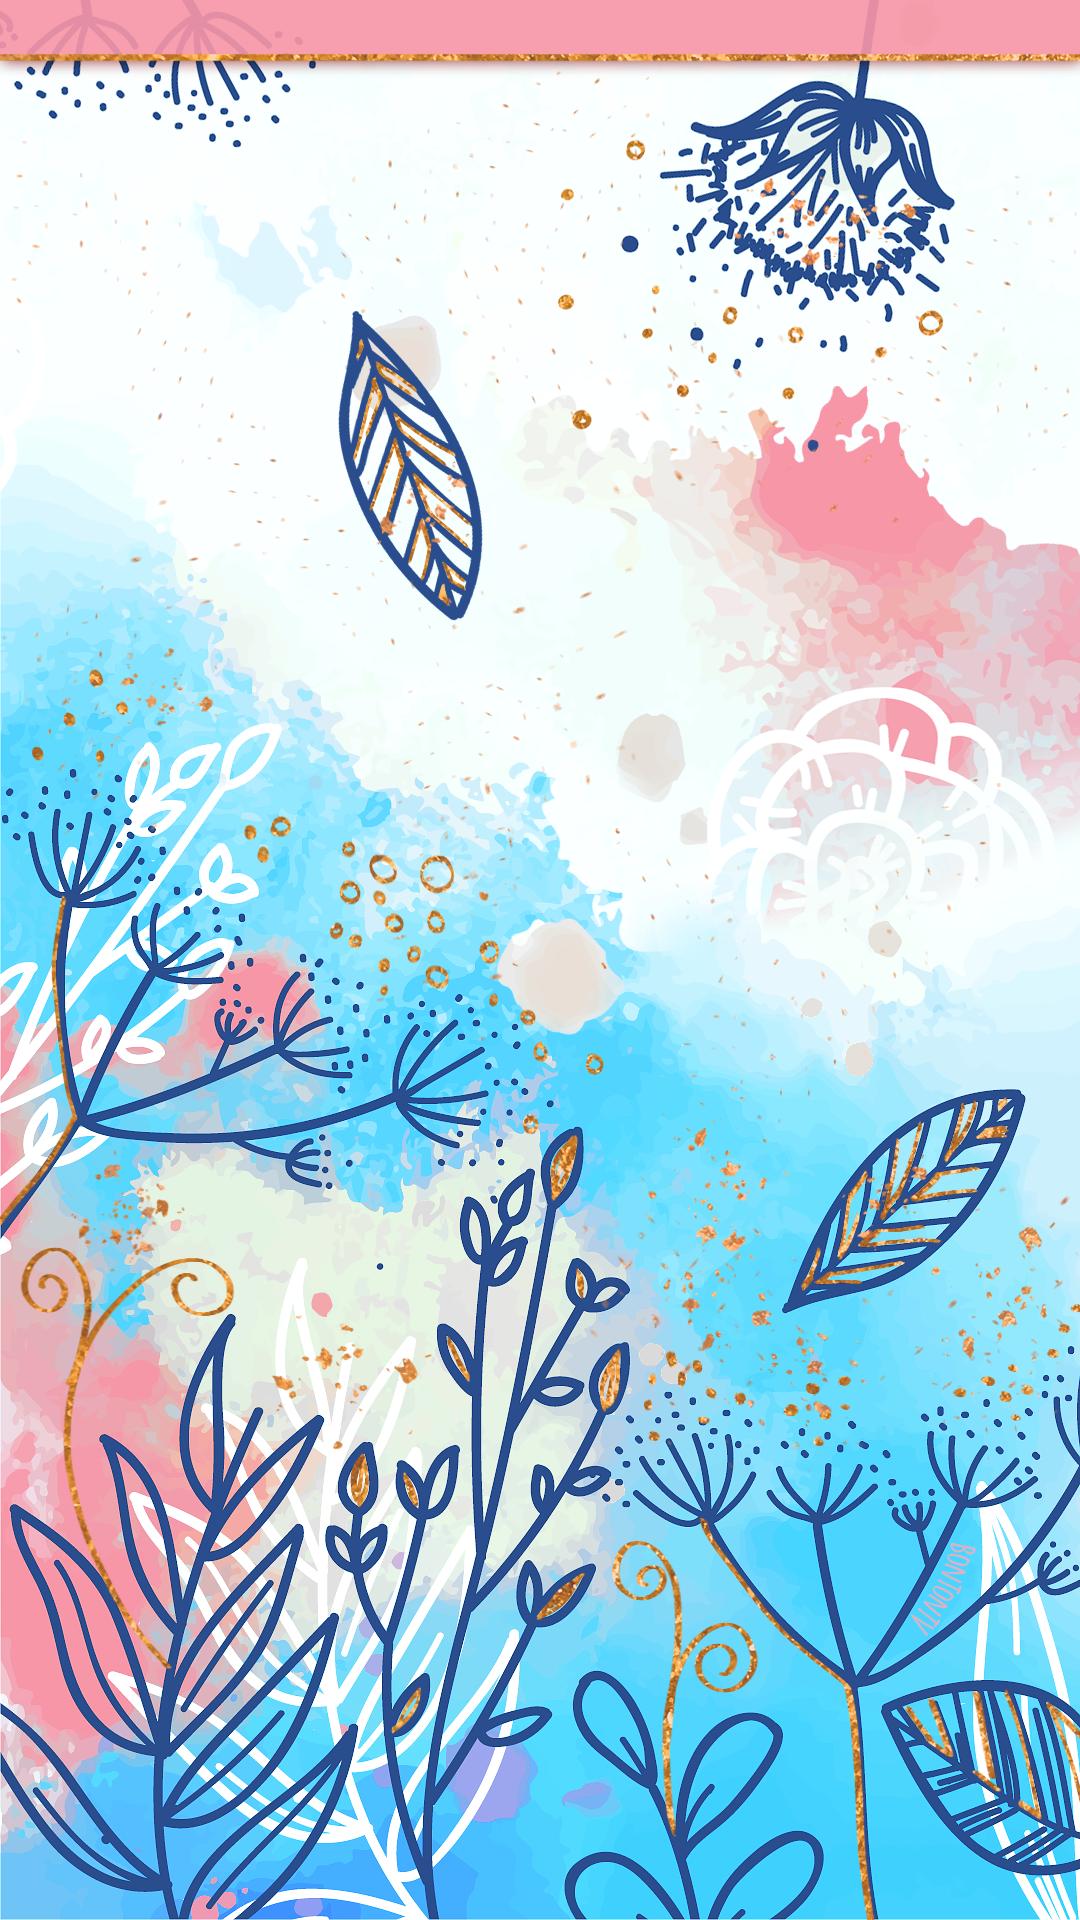 Hd Phone Wallpapers By Bonton Tv Free Backgrounds 1080x1920 Wallpapers Iphone Smartphone Here Iphone Wallpaper Girly Hd Cute Wallpapers Artsy Background